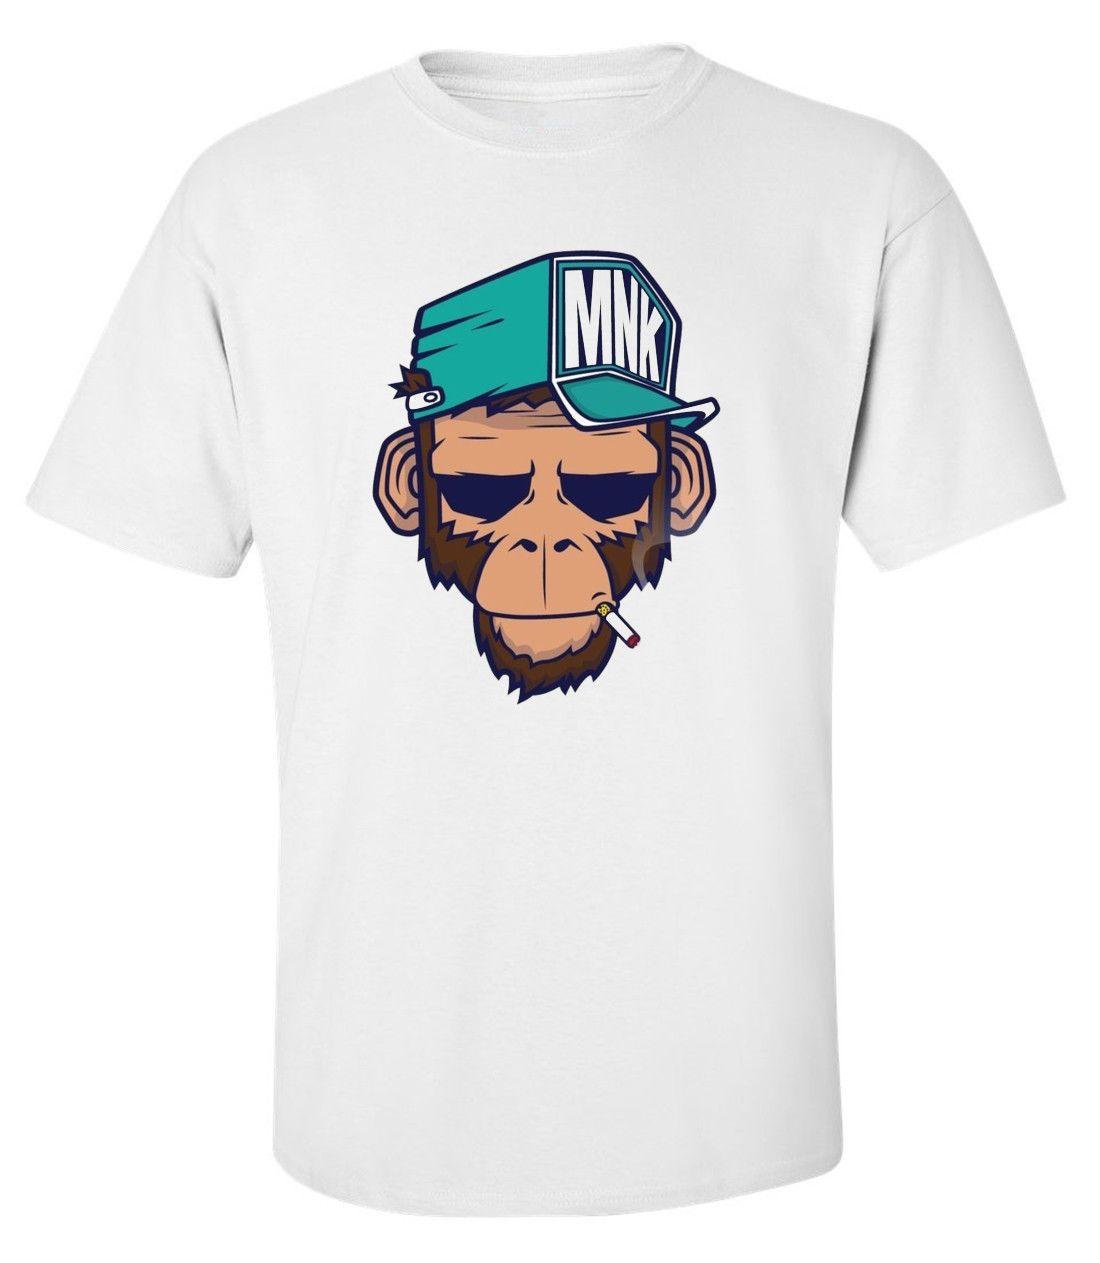 5721b8ad6c327e Hip Hop Monkey Funny Rap Music Animal Printed Cotton Men T-shirt Top Tee  Online with $13.66/Piece on Tshirtsdesign49's Store | DHgate.com